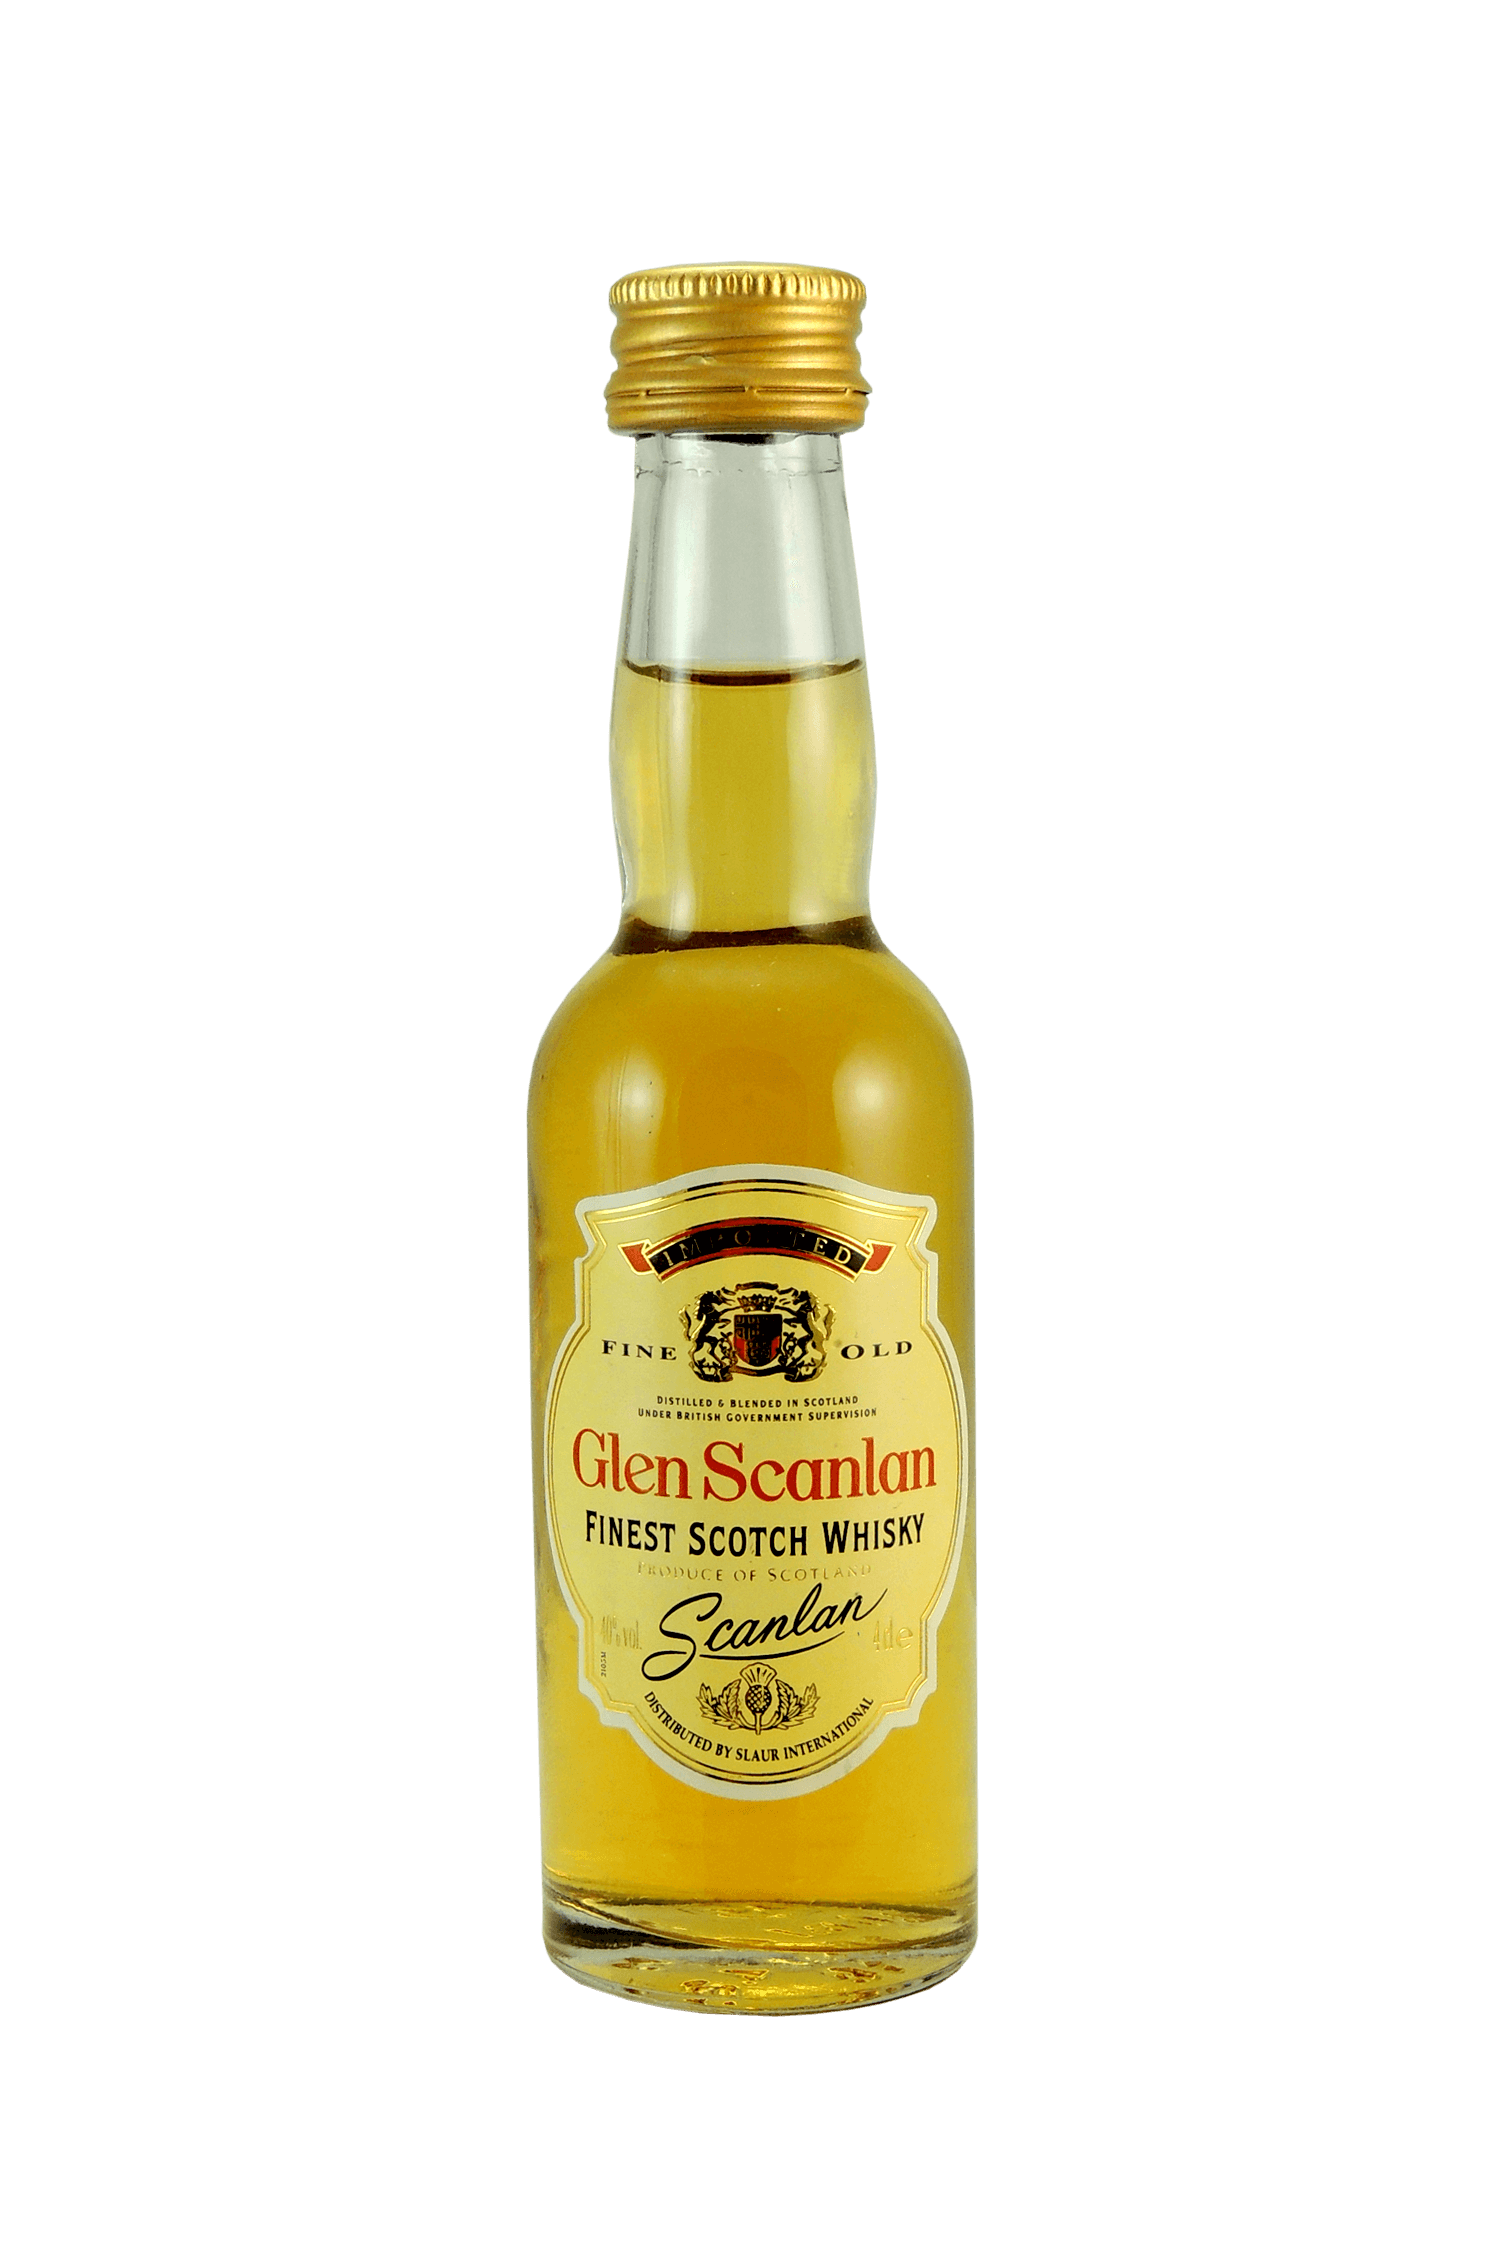 Glen Scanlan Scotch Whisky